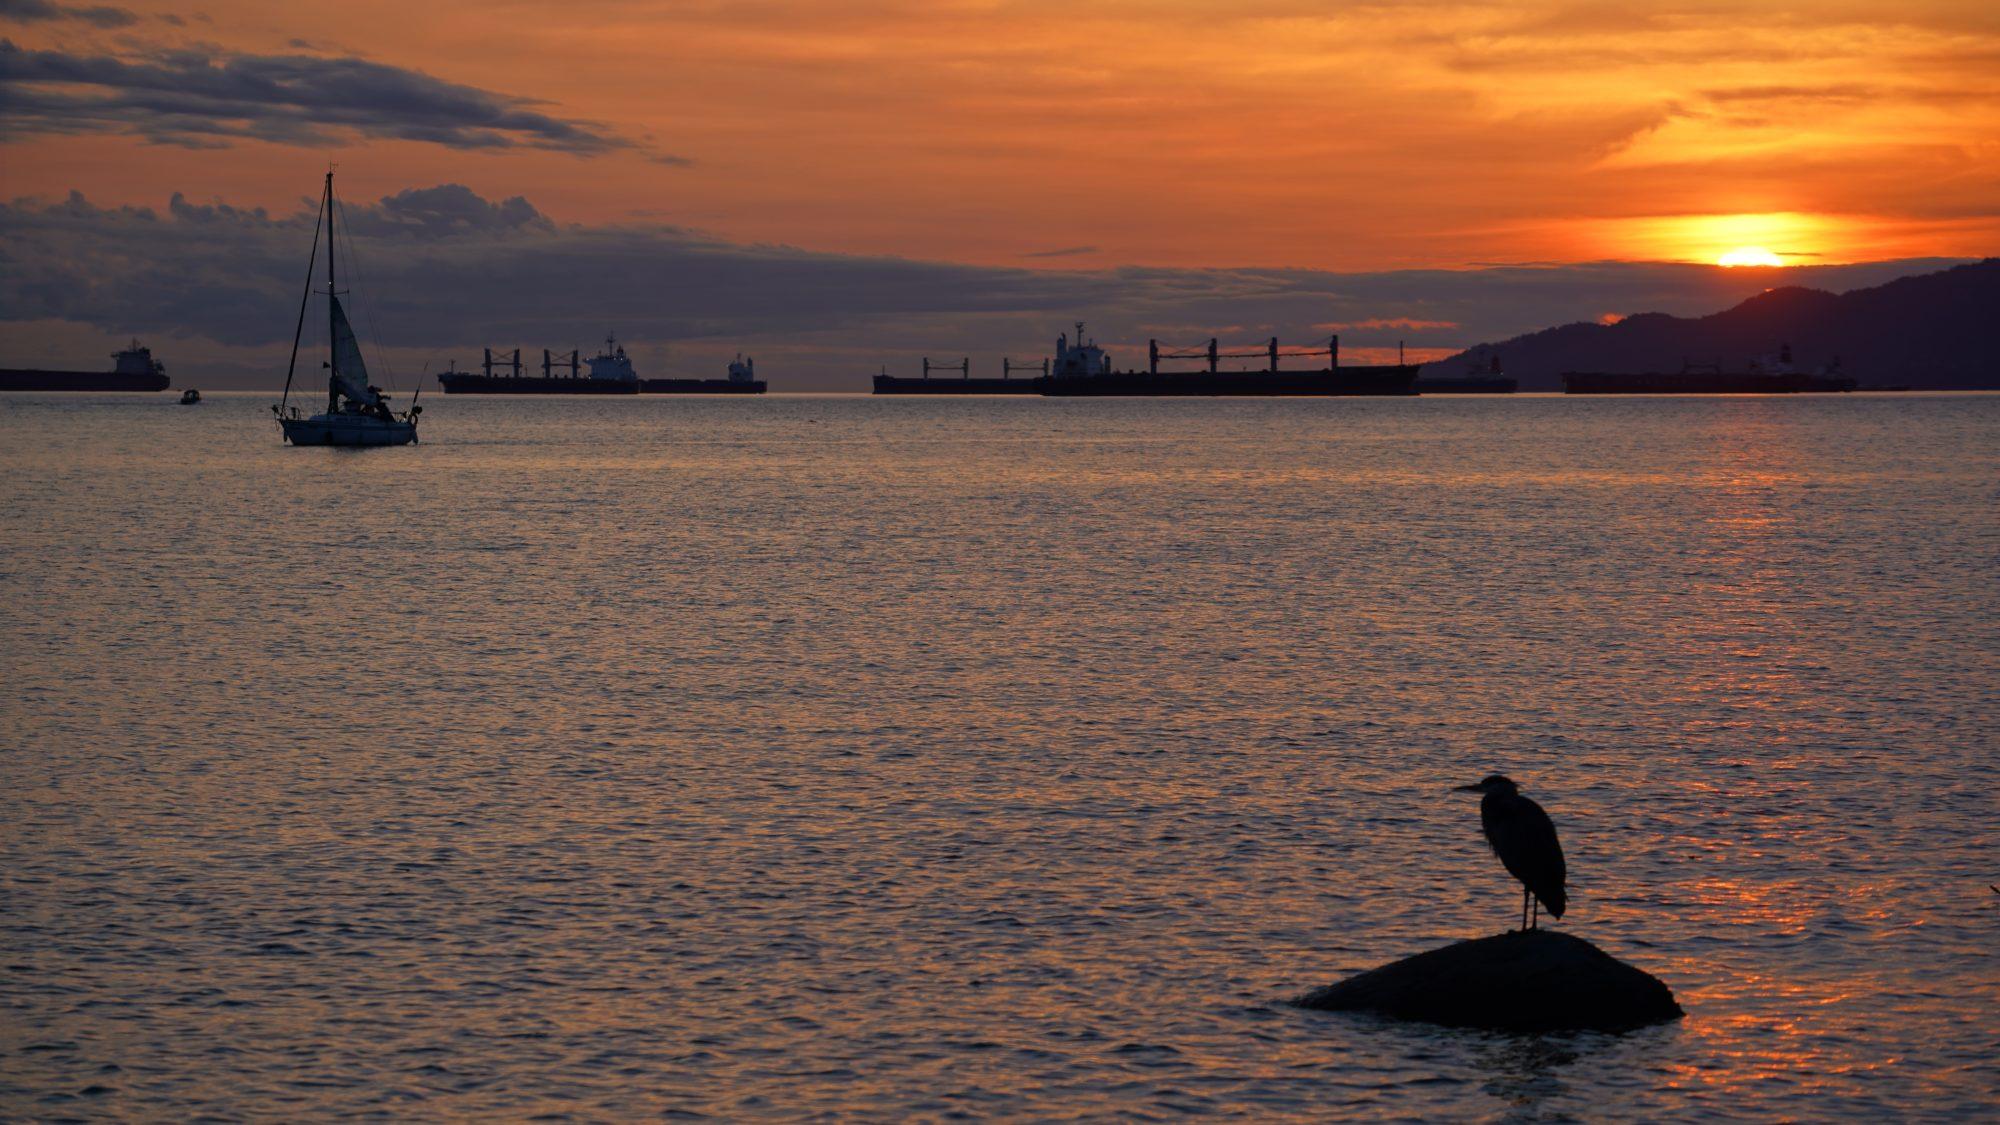 Heron watching the sunset